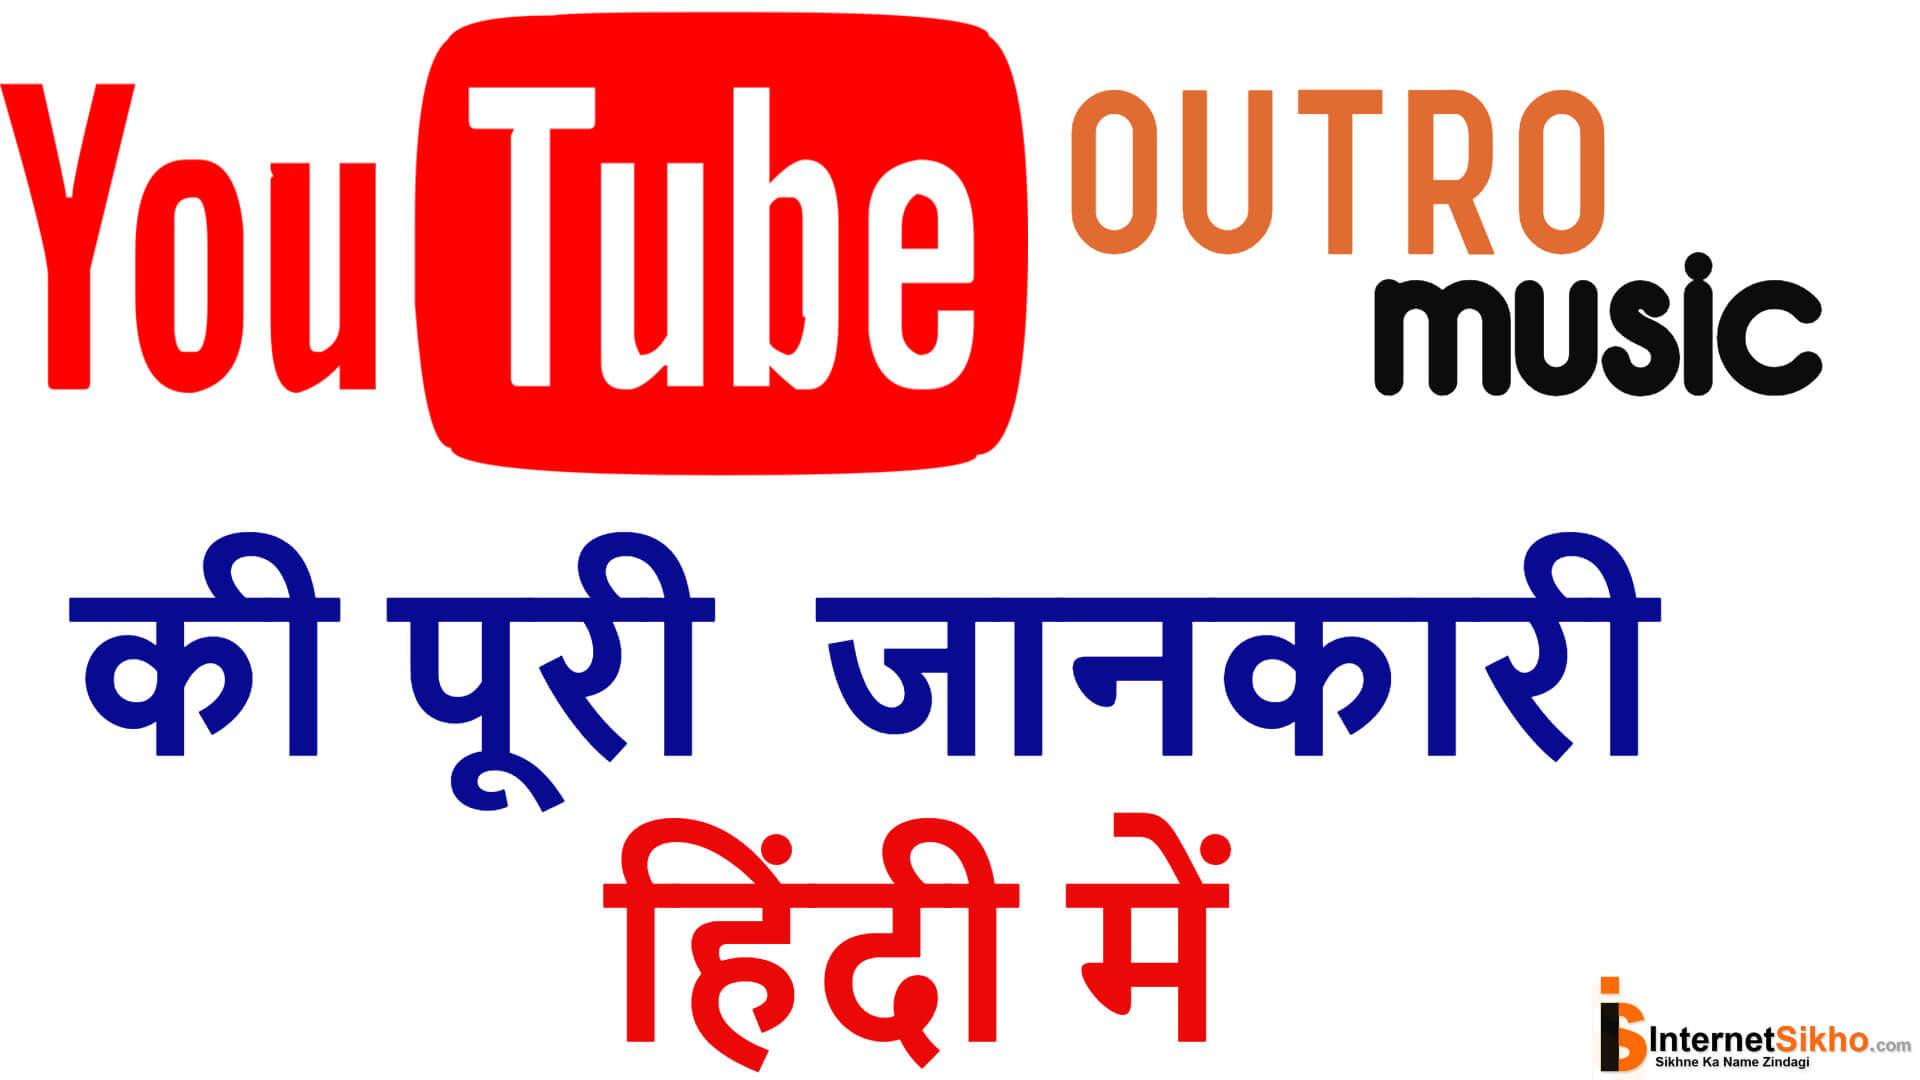 Youtube Outro Music Kya Hai?Youtube Outro Music Ki Puri Jankari Hindi Mein